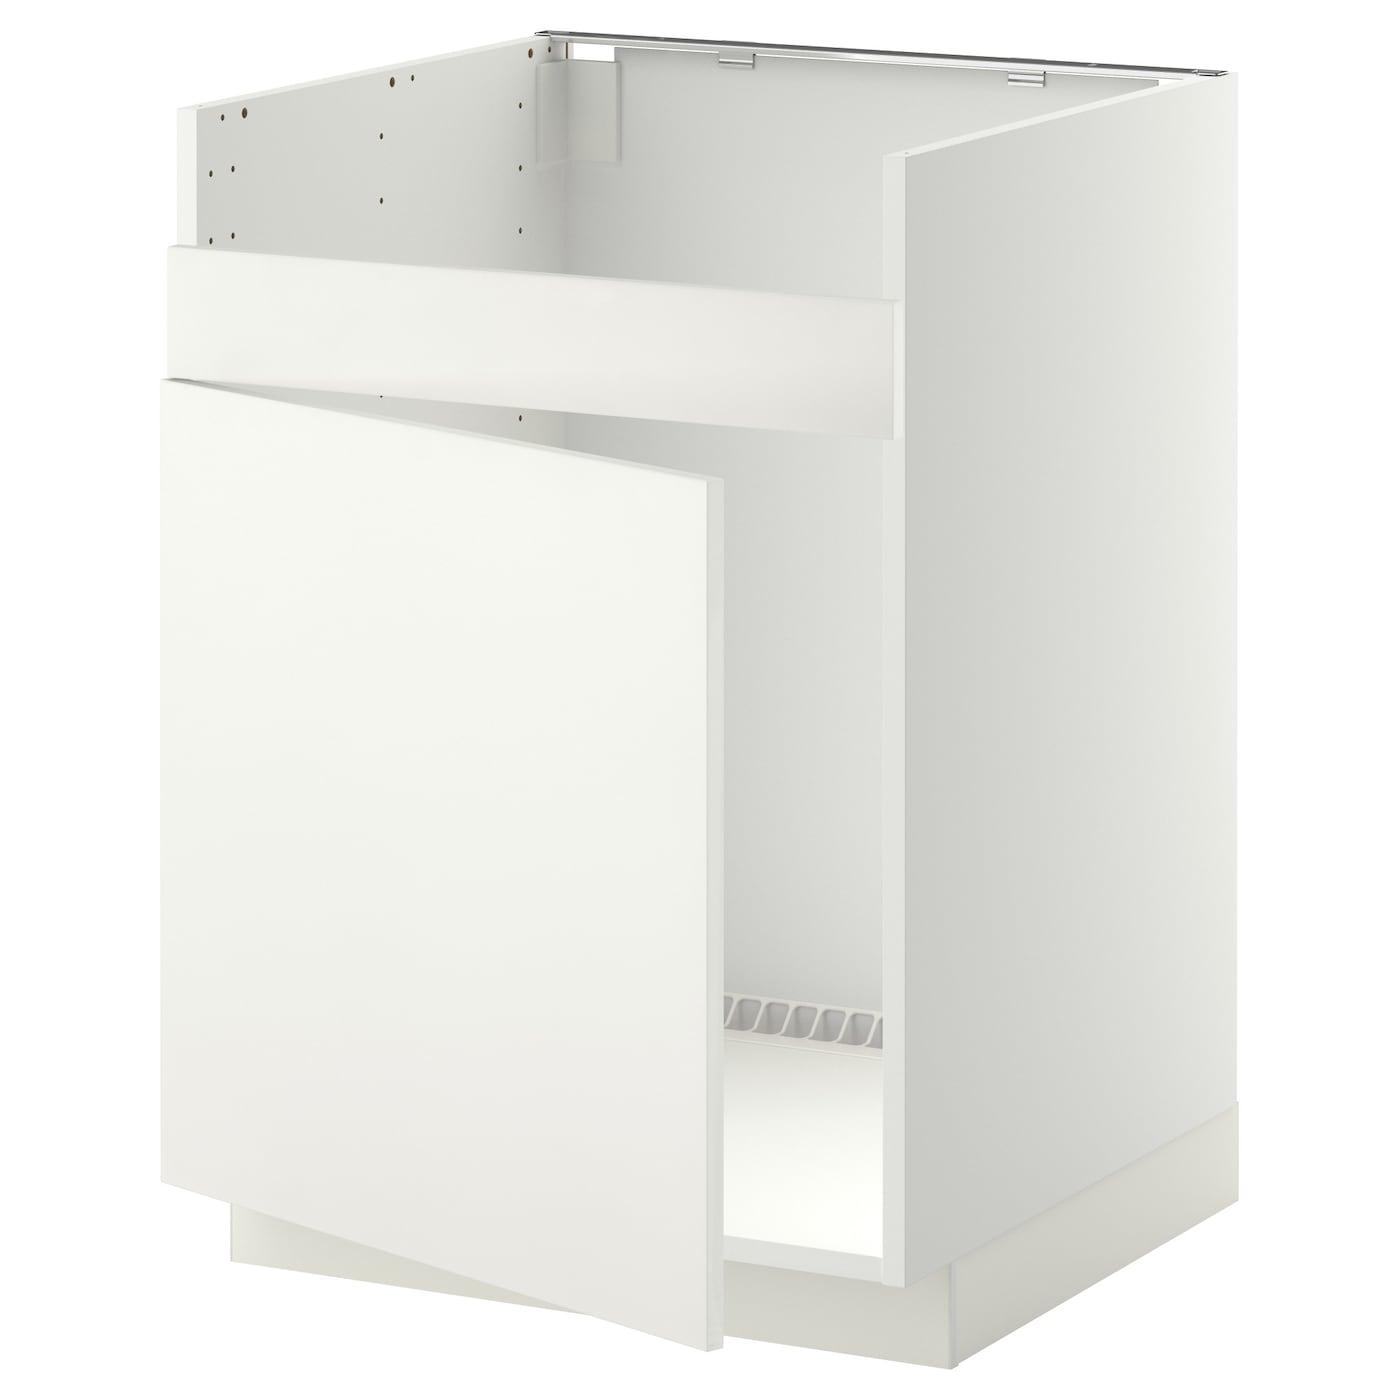 metod base cab f domsj single bowl sink white h ggeby white 60x60 cm ikea. Black Bedroom Furniture Sets. Home Design Ideas